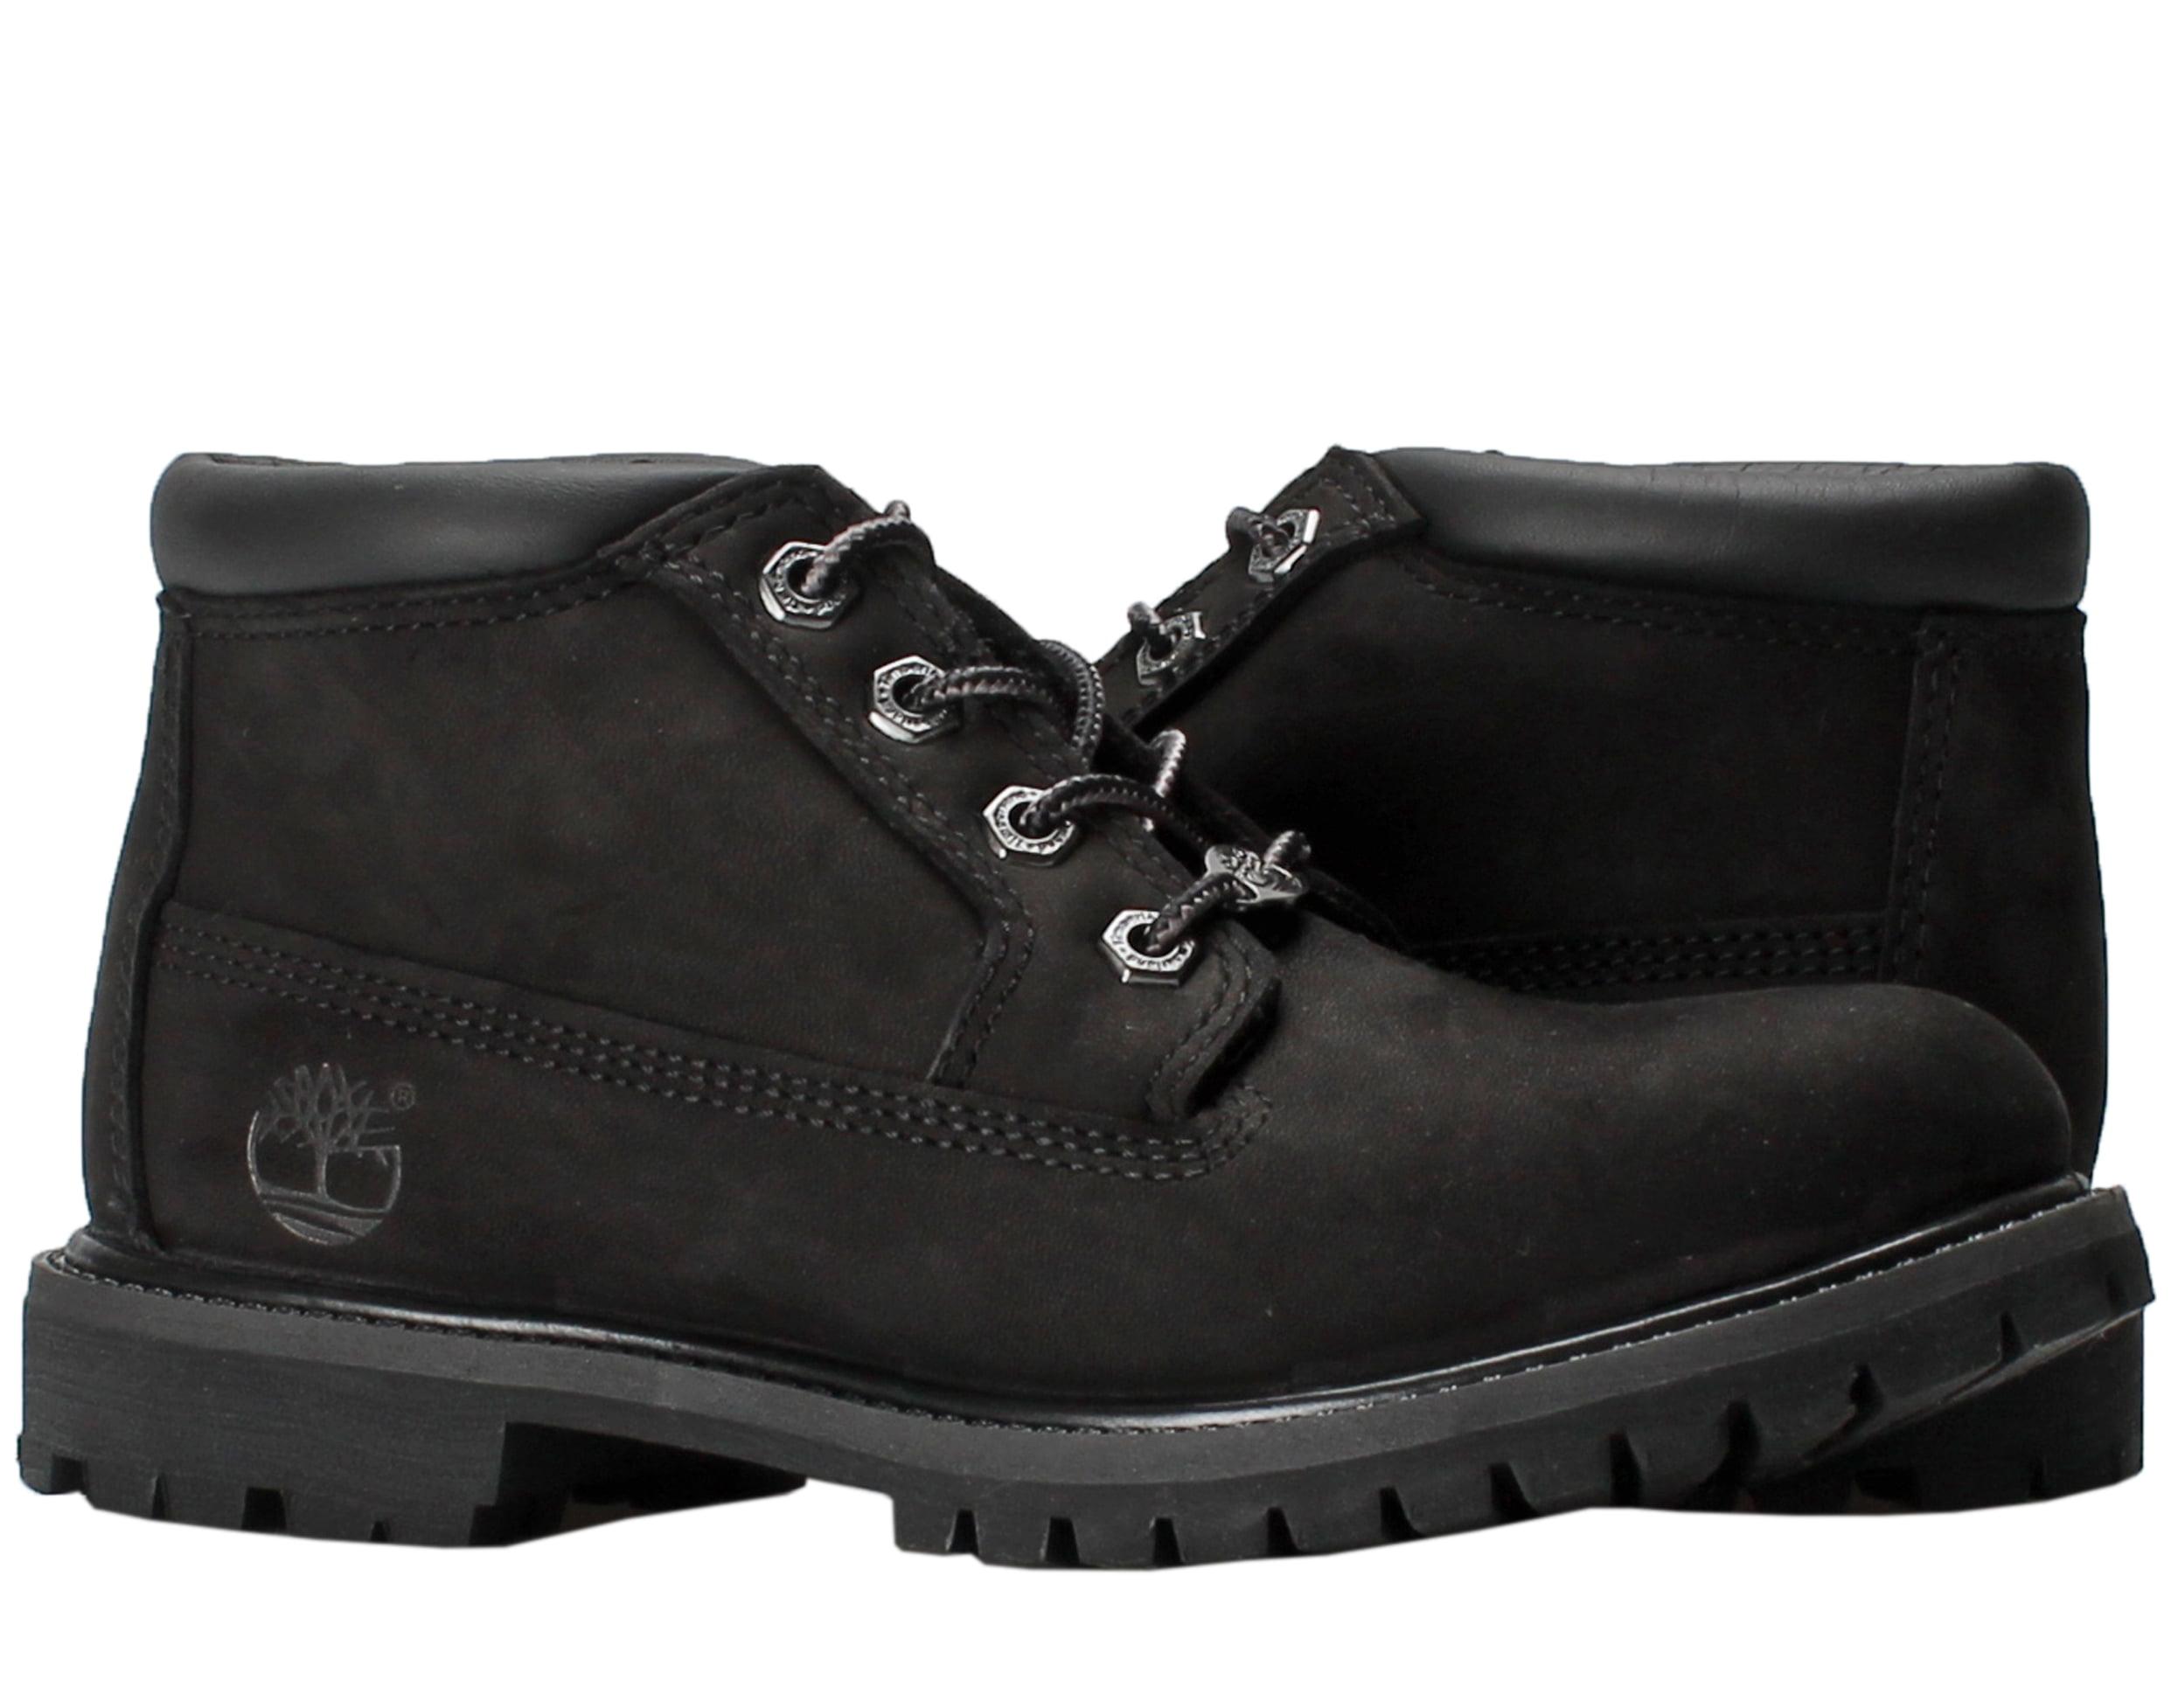 Timberland Nellie Chukka Black Nubuck Women's Boots 23398 by Timberland